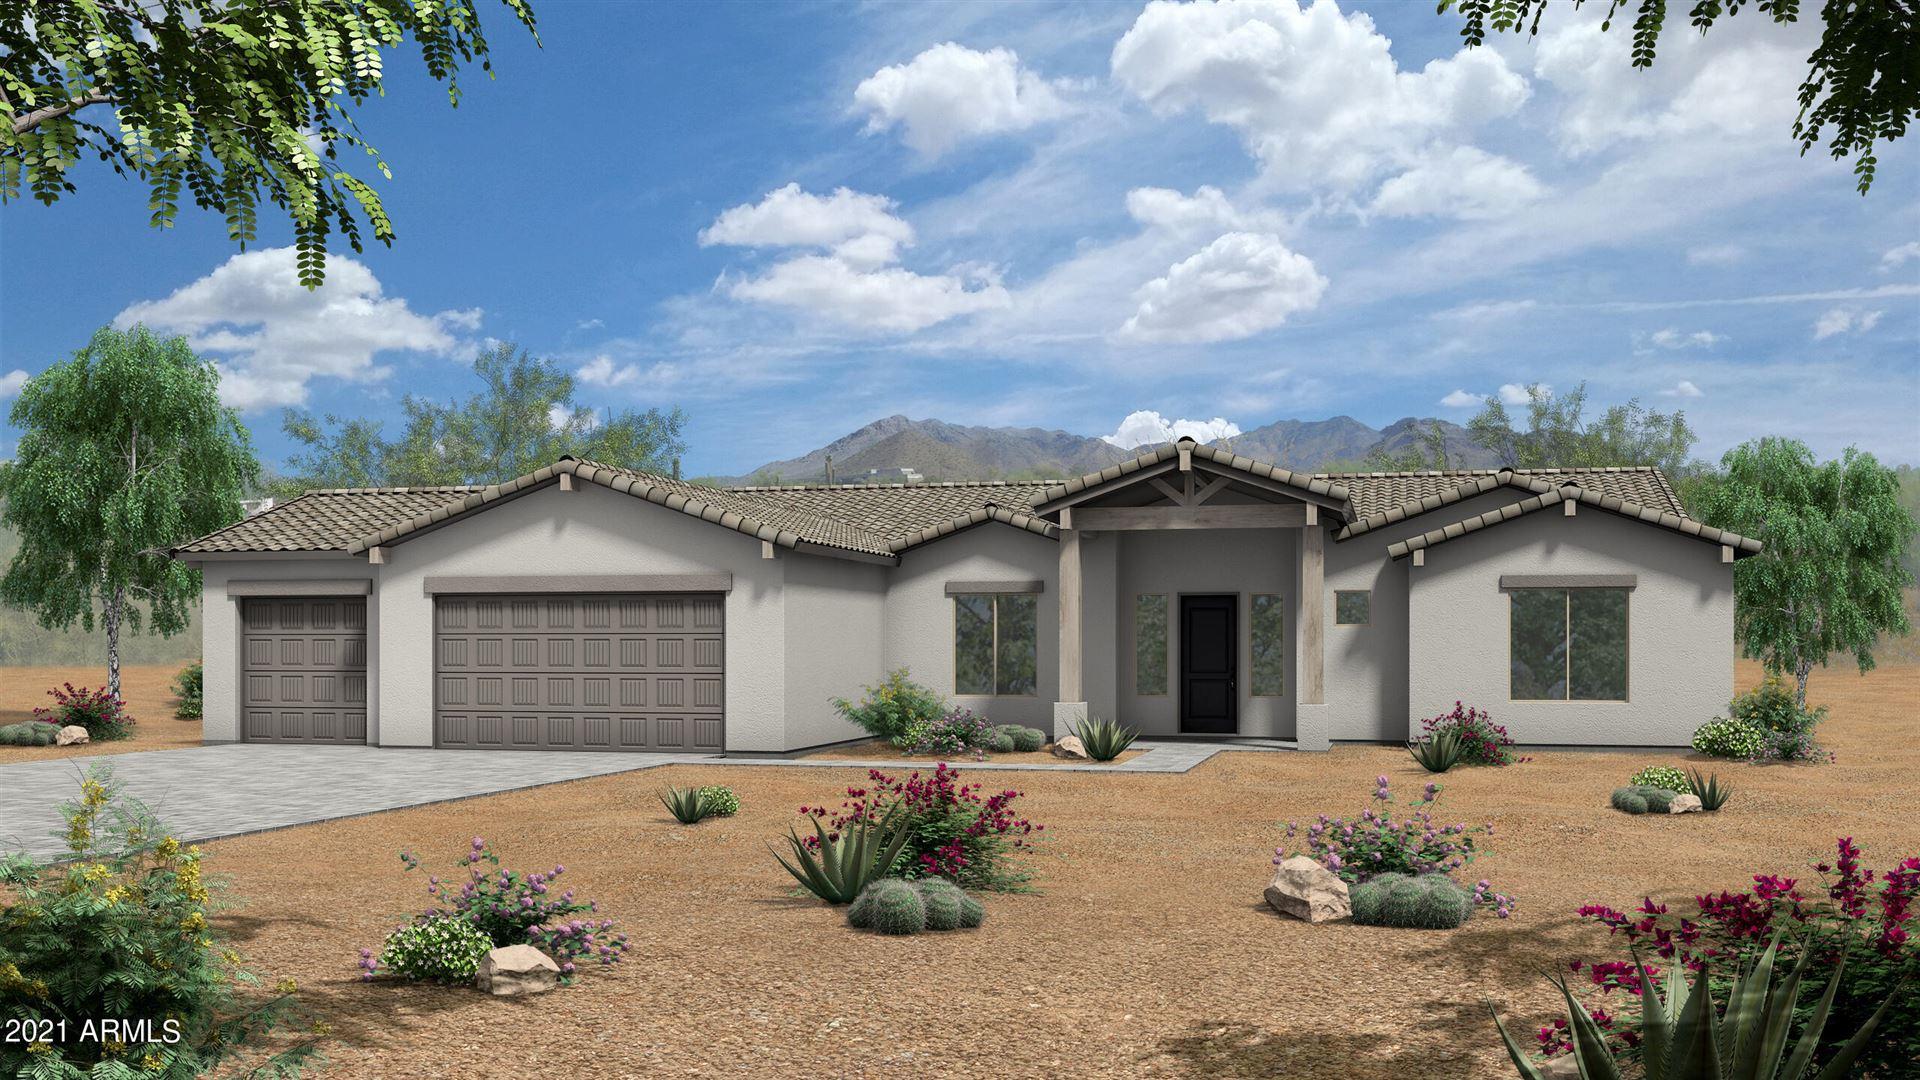 Photo of Xxx N 13 Avenue #Lot 2, New River, AZ 85087 (MLS # 6249589)